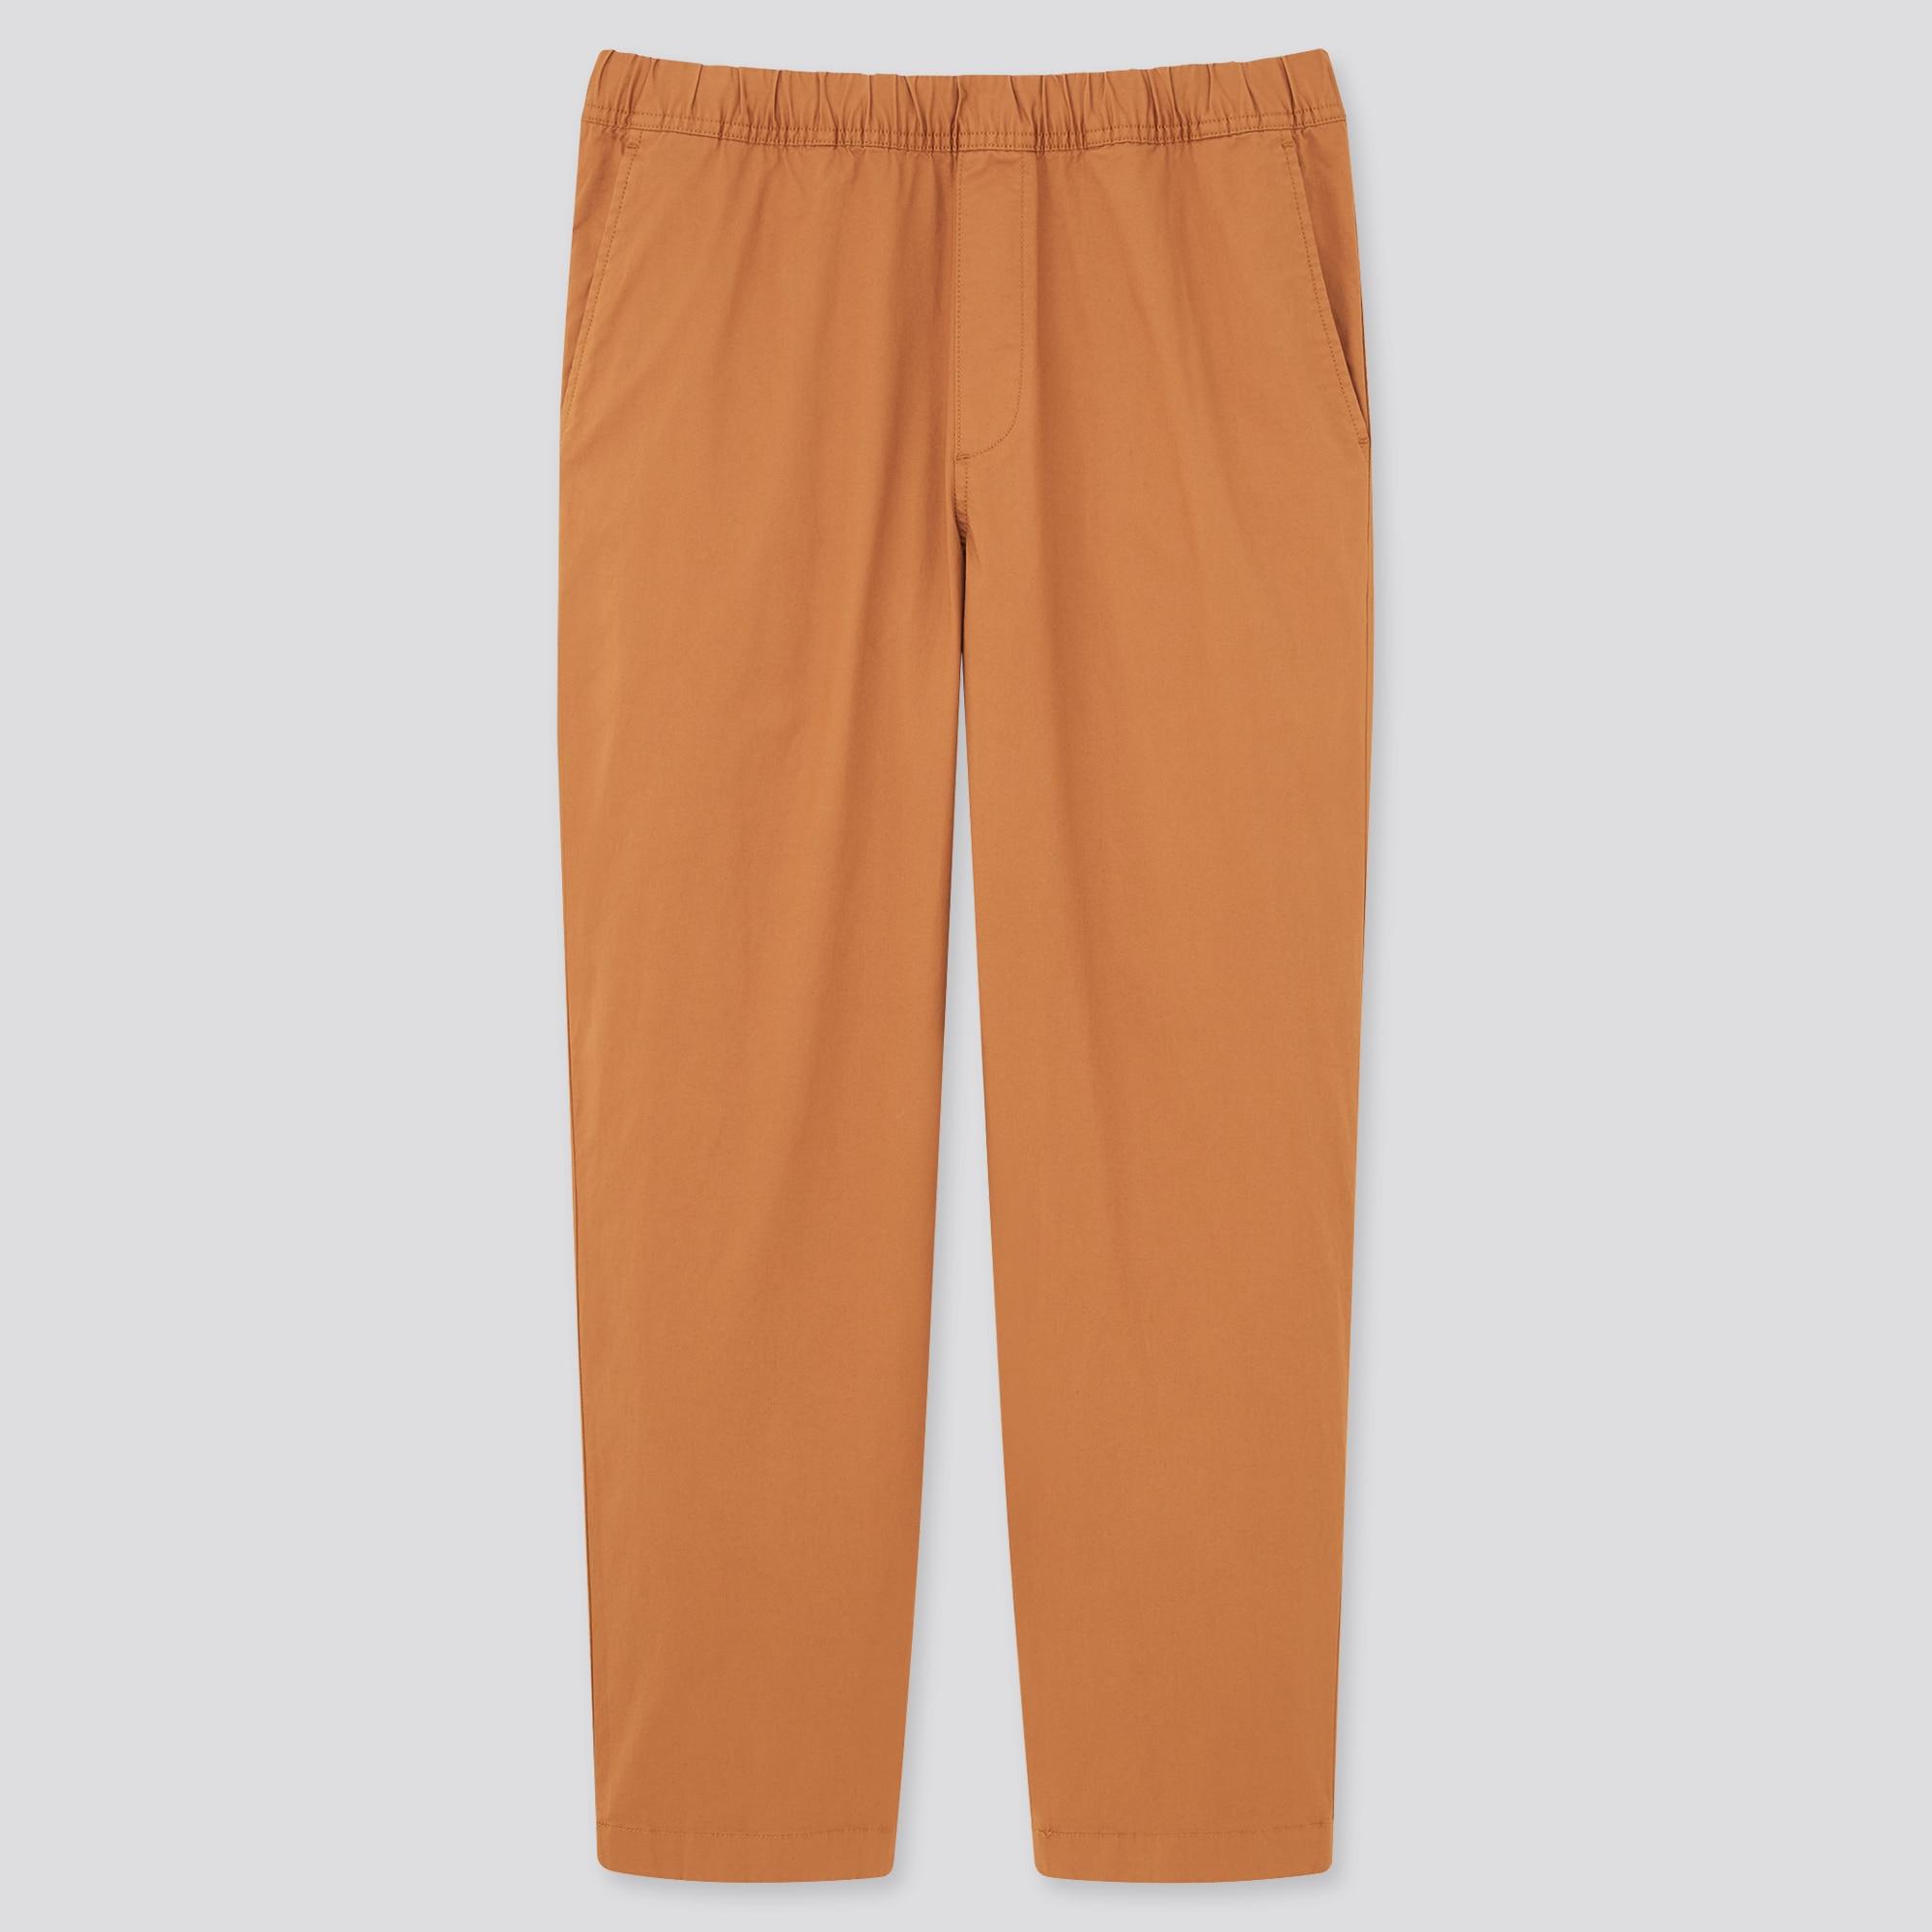 men cotton relaxed ankle pants : Color - 32 Beige, Size - M (433520)